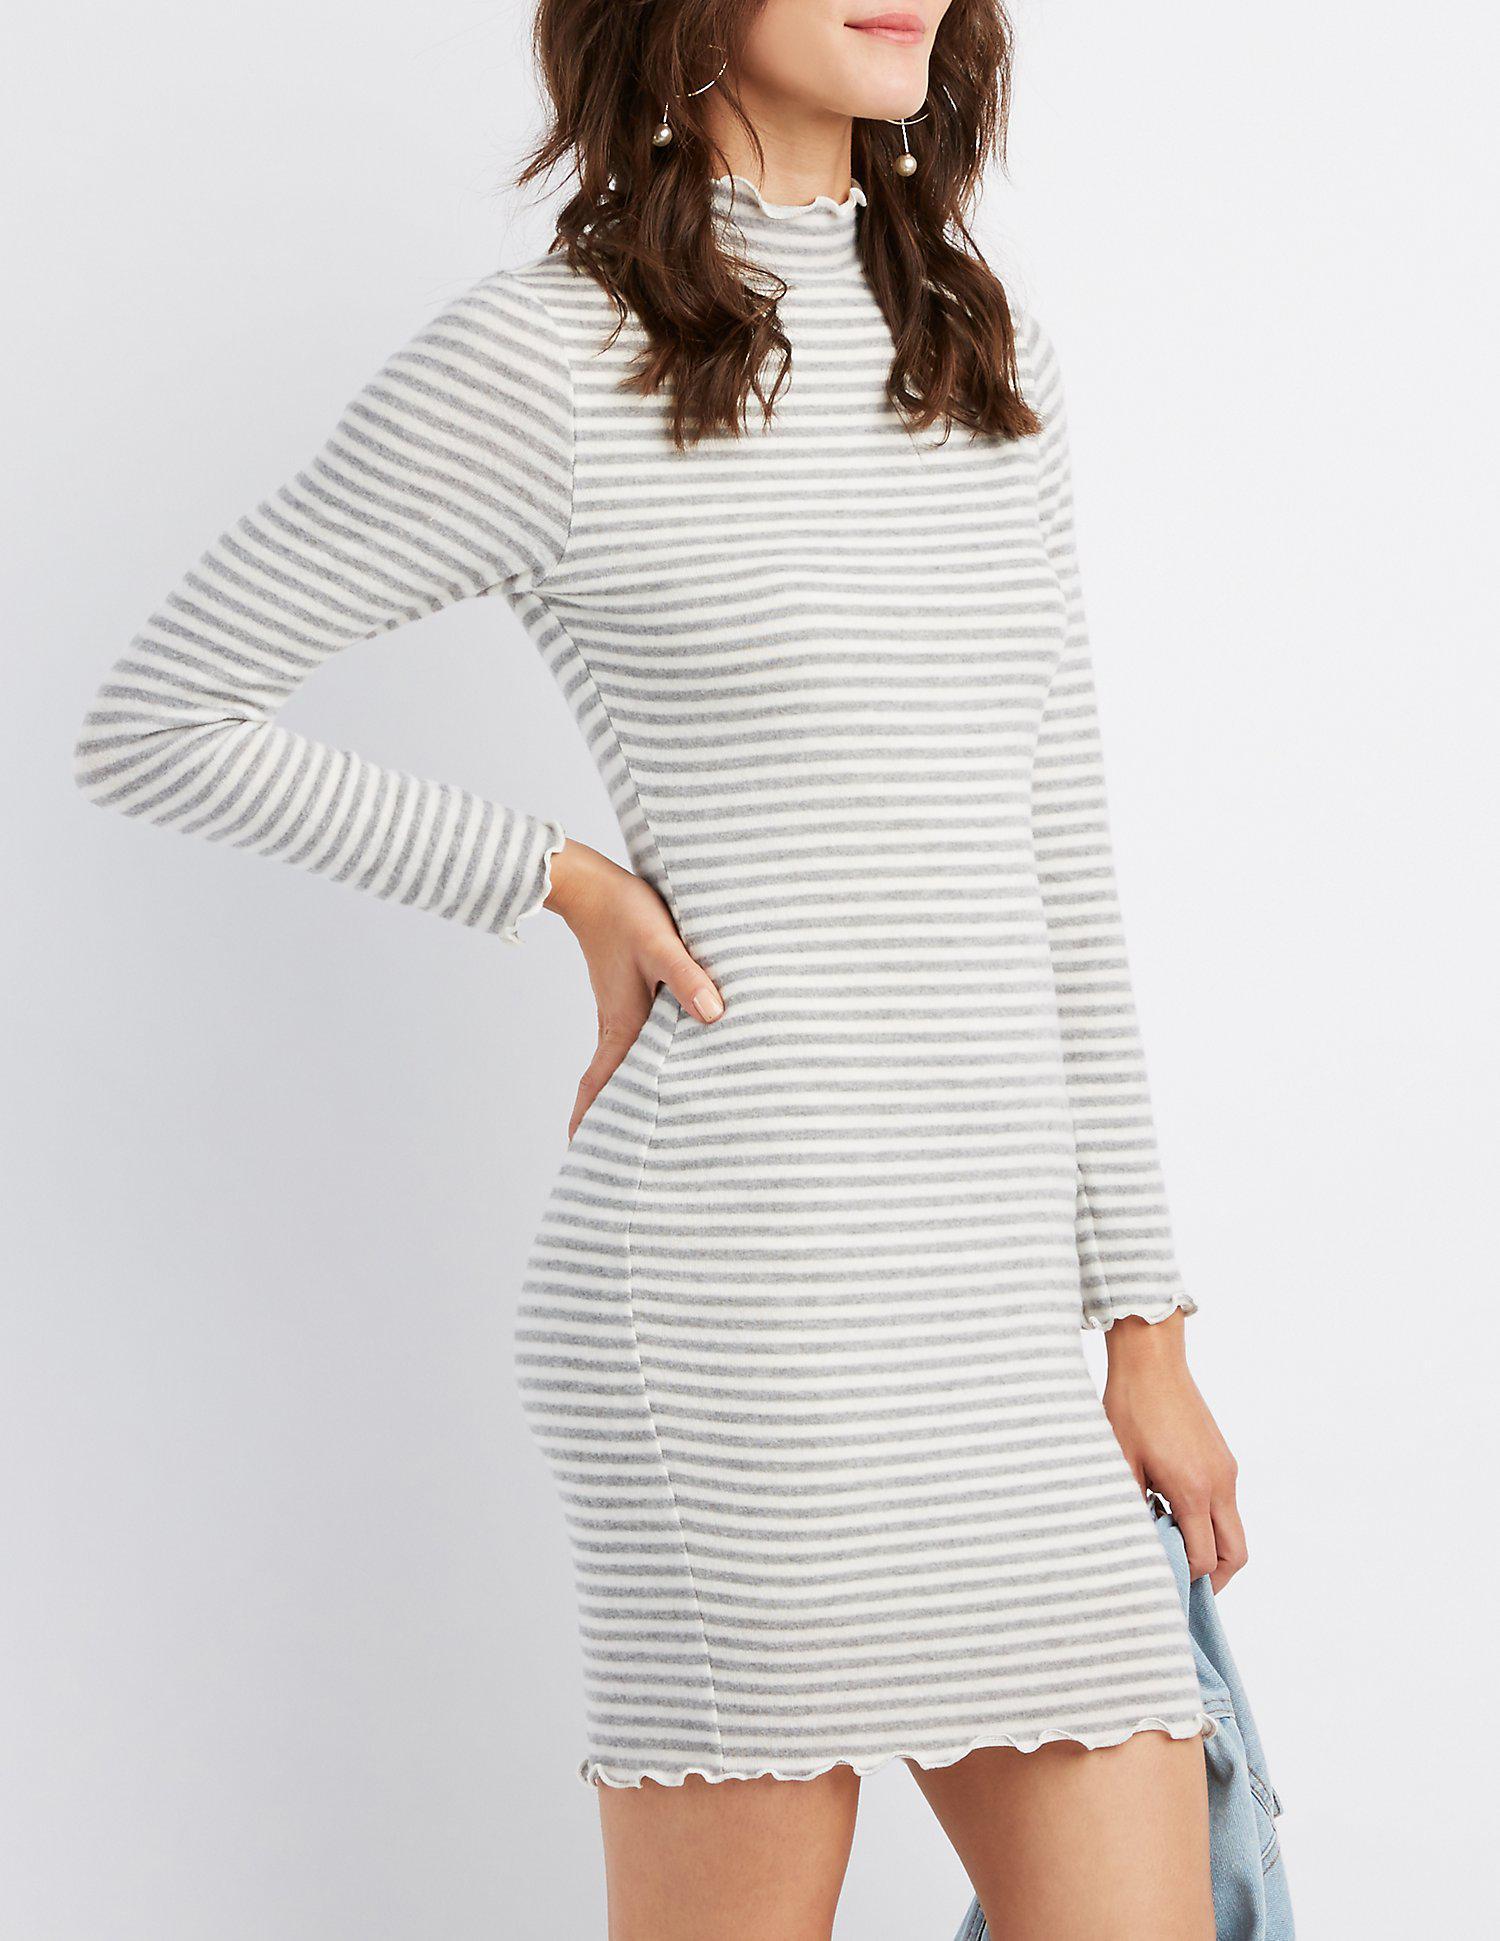 2643806a949 Lyst - Charlotte Russe Lettuc-trim Striped Sweater Dress in Gray ...